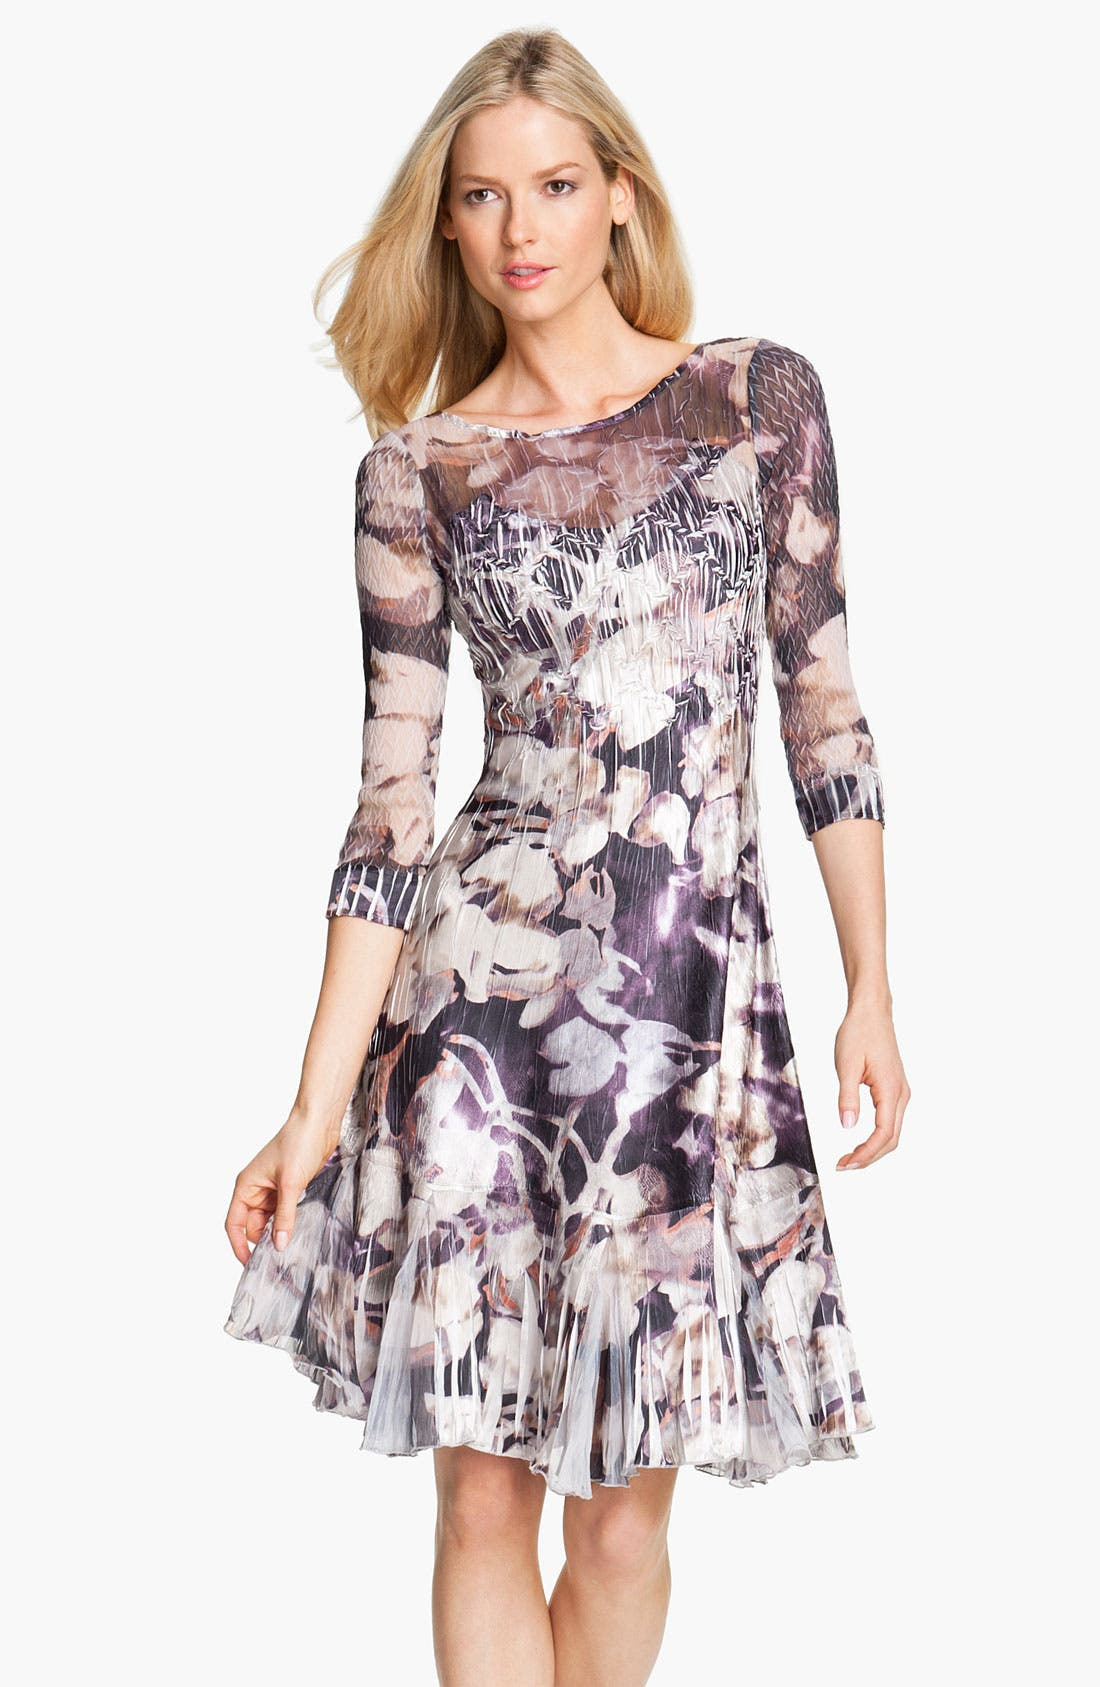 Alternate Image 1 Selected - Komarov Floral Print Crinkle Charmeuse Dress